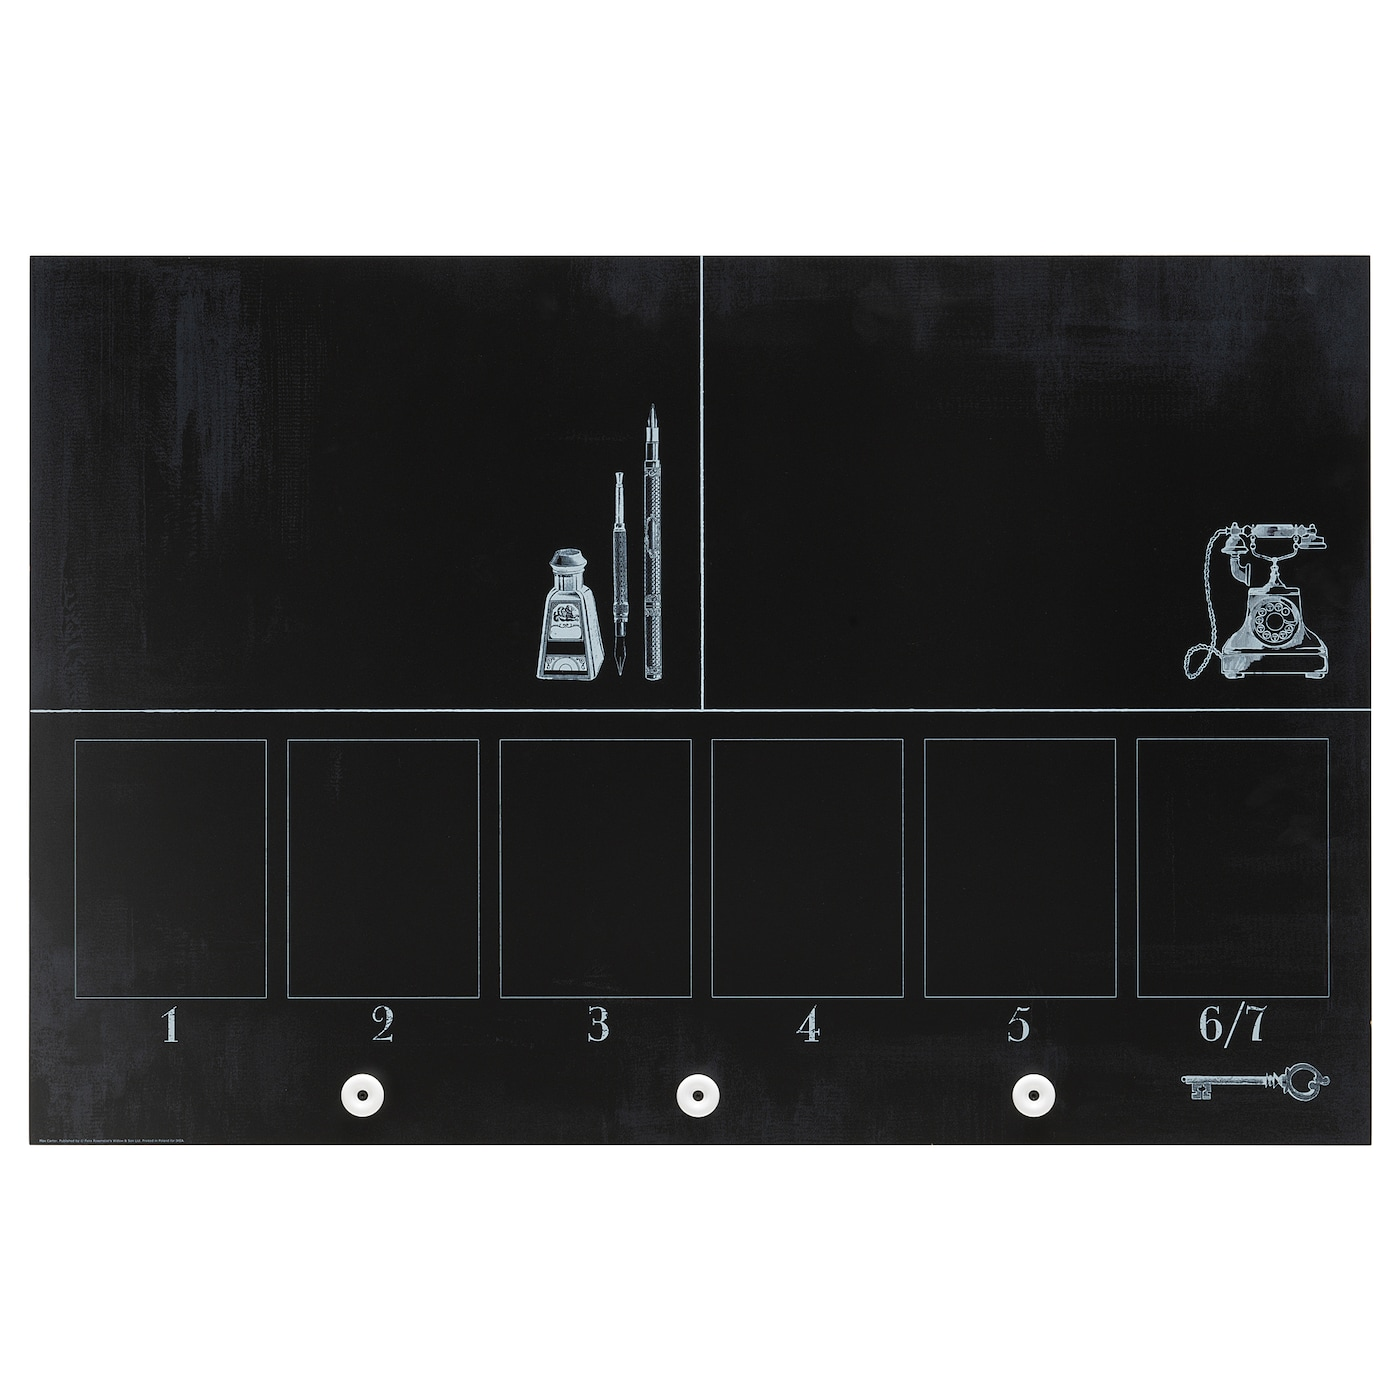 IKEA MLARNA blackboard planner